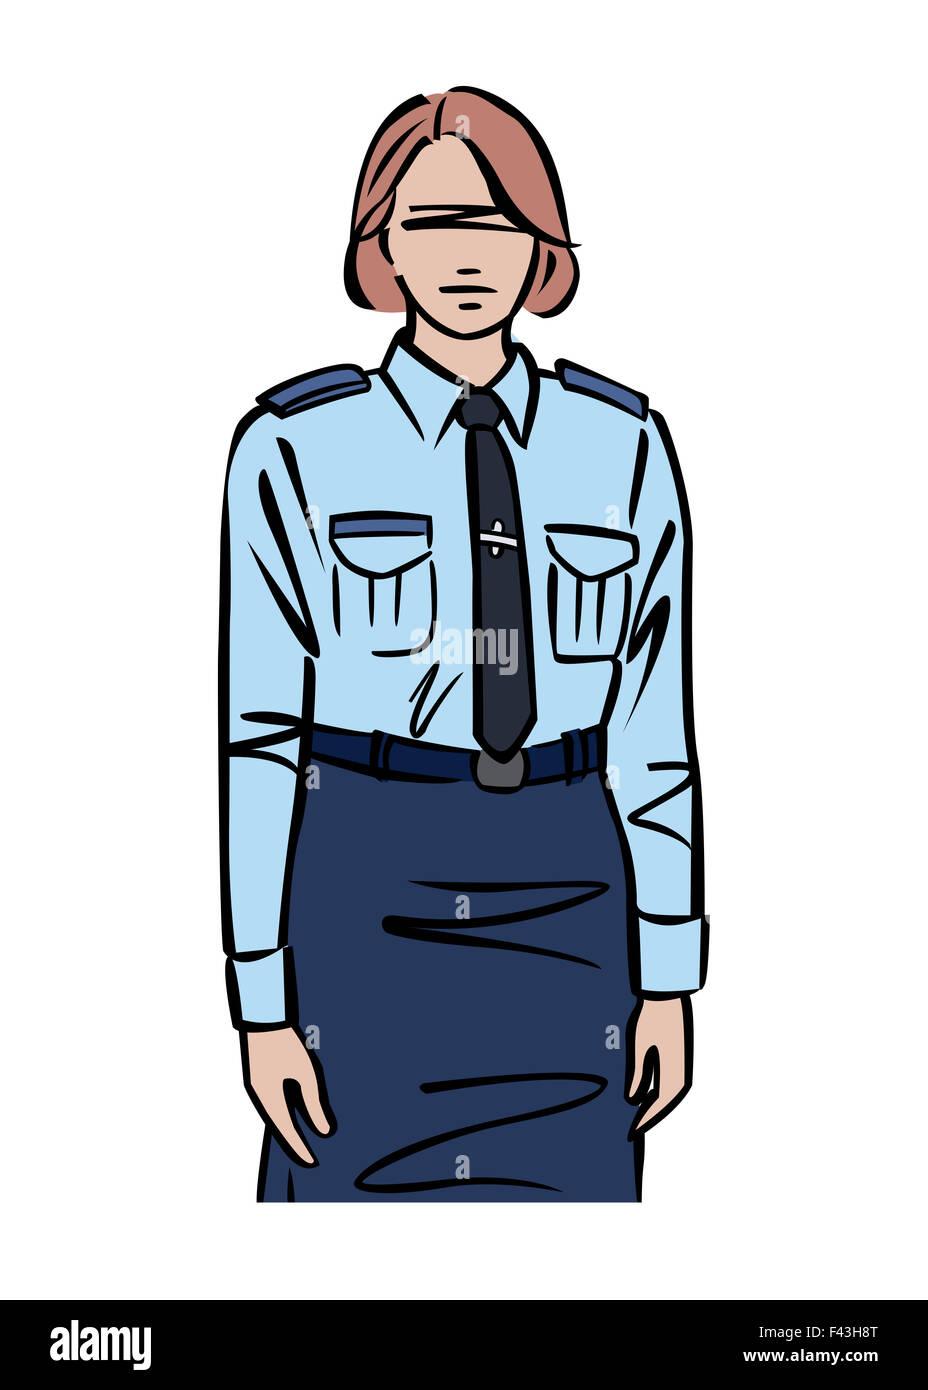 Illustration of female police officer - Stock Image